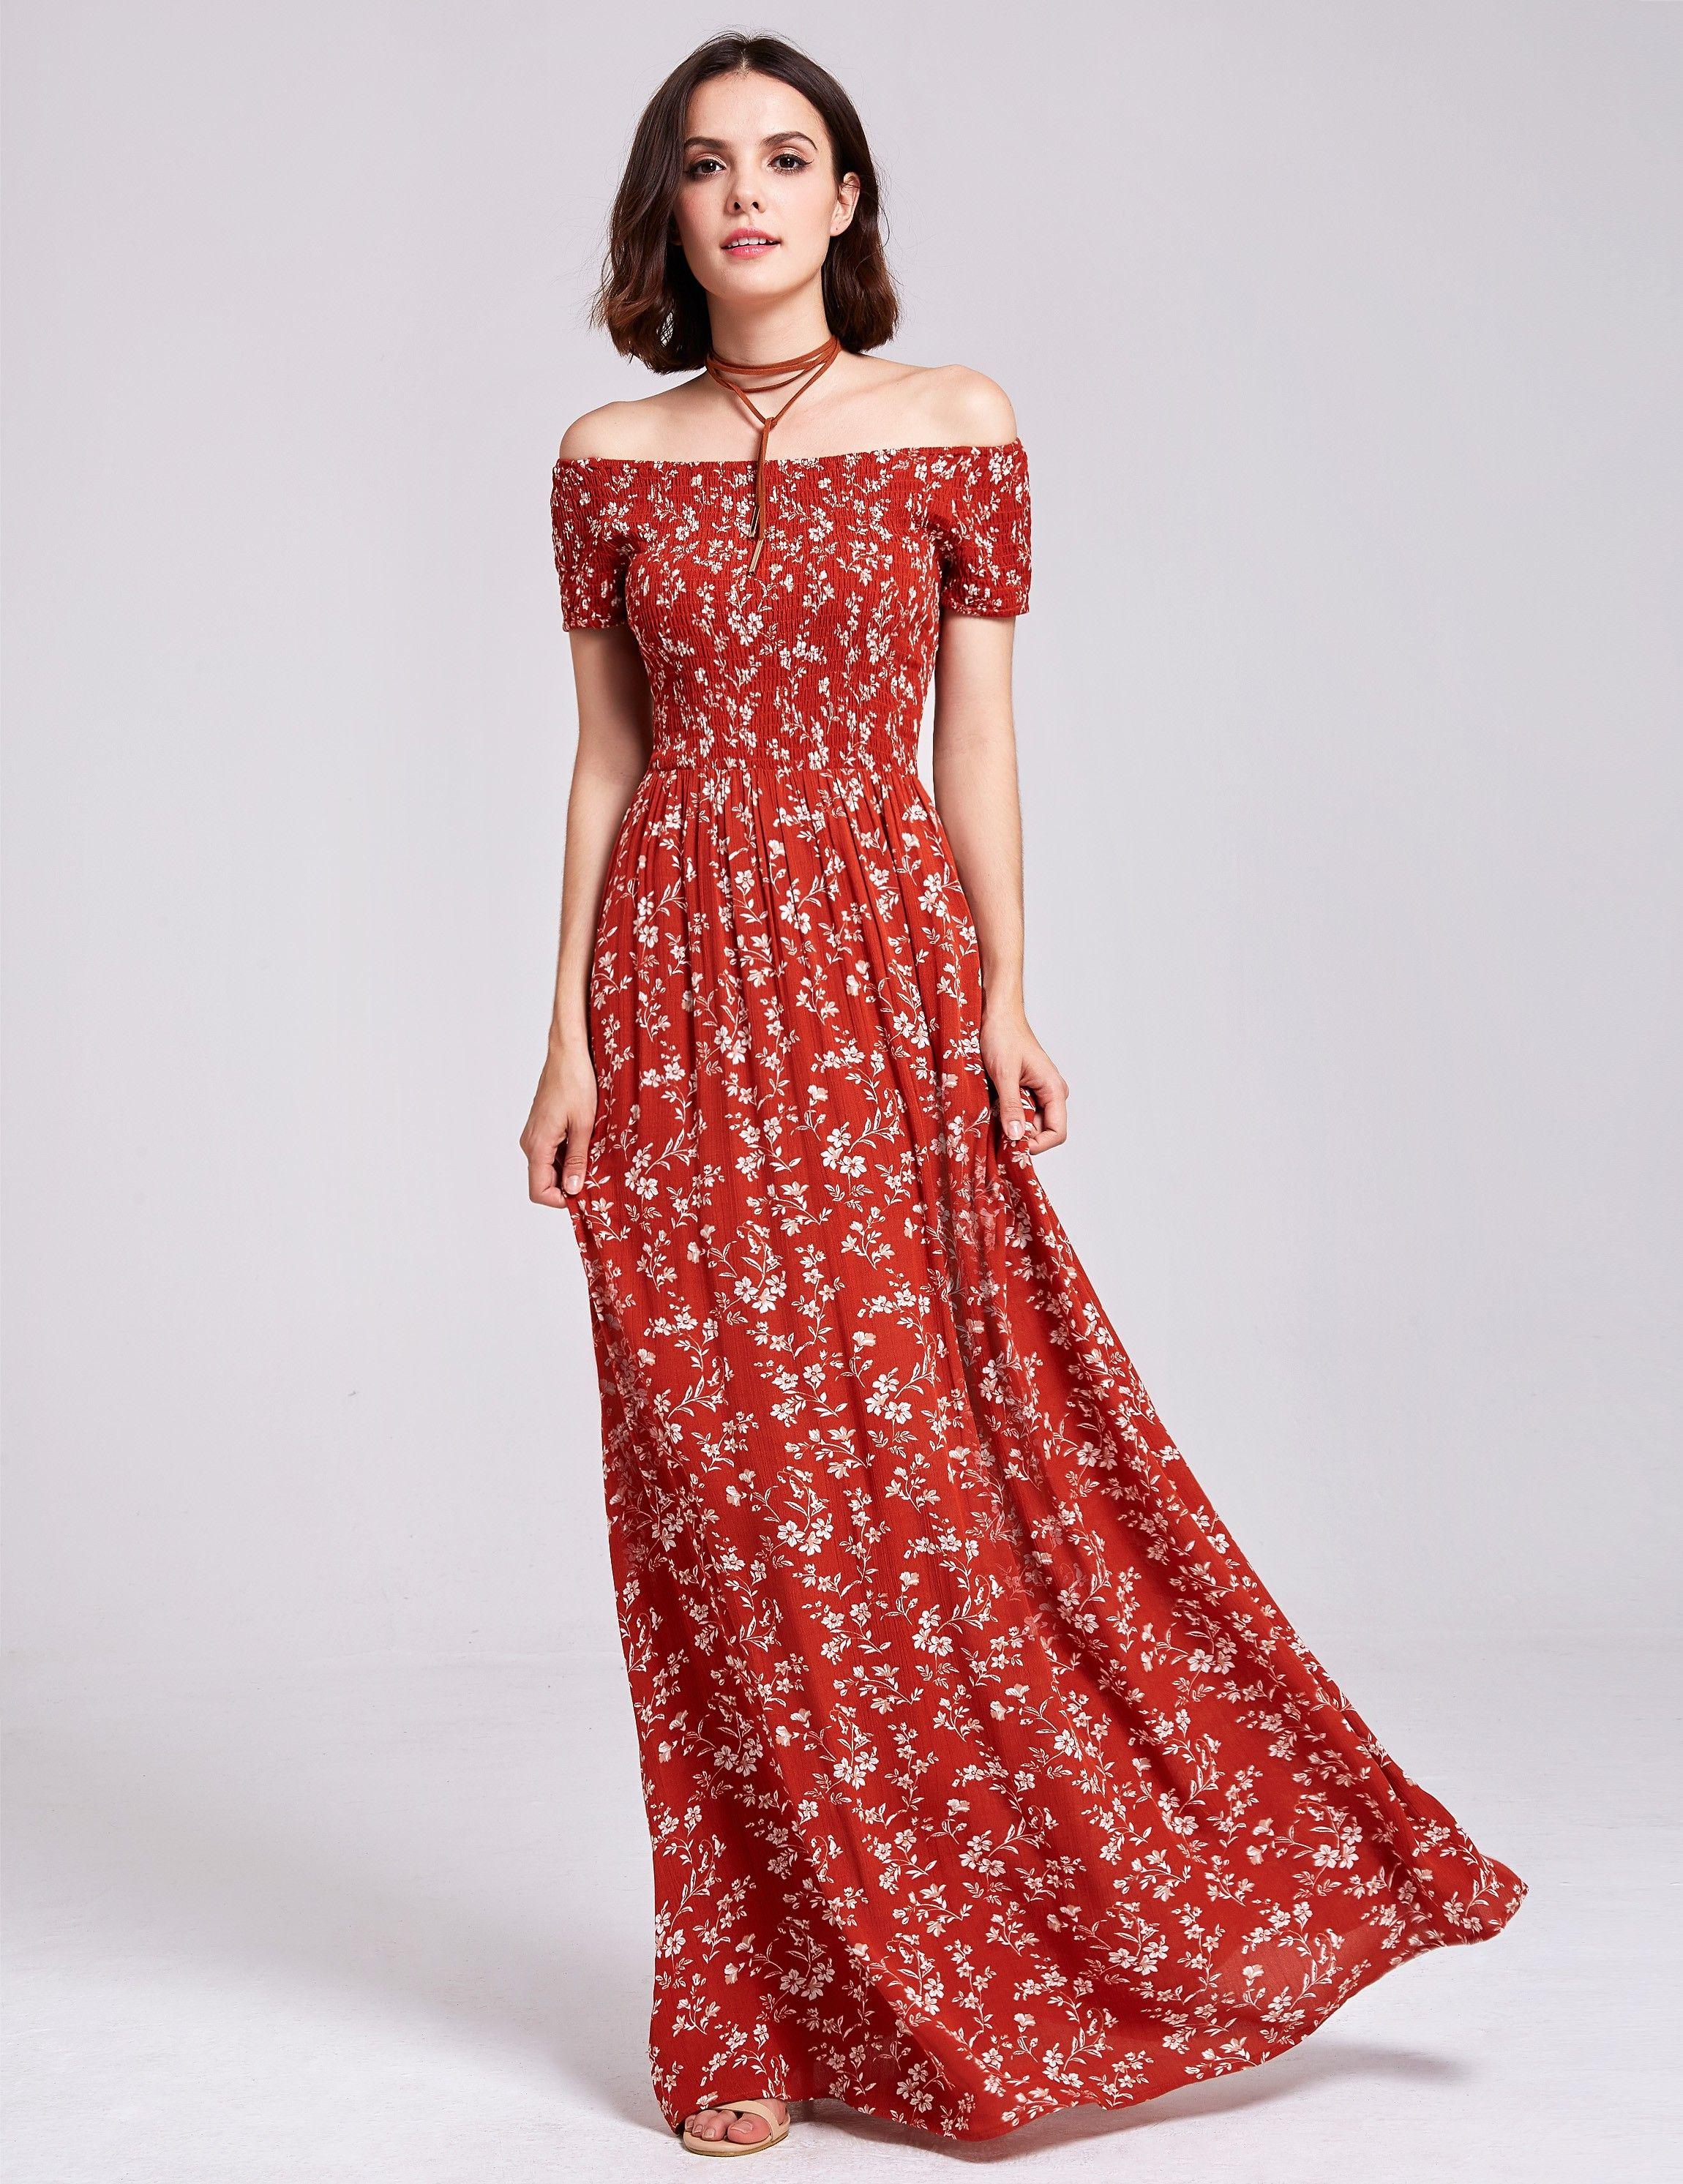 60df909b5c702 Alisa Pan Printed Off Shoulder Summer Maxi Dress | Ever-Pretty #summerdress  #summer #floraldress #printdress #EverPretty #offshoulderdress #maxidress